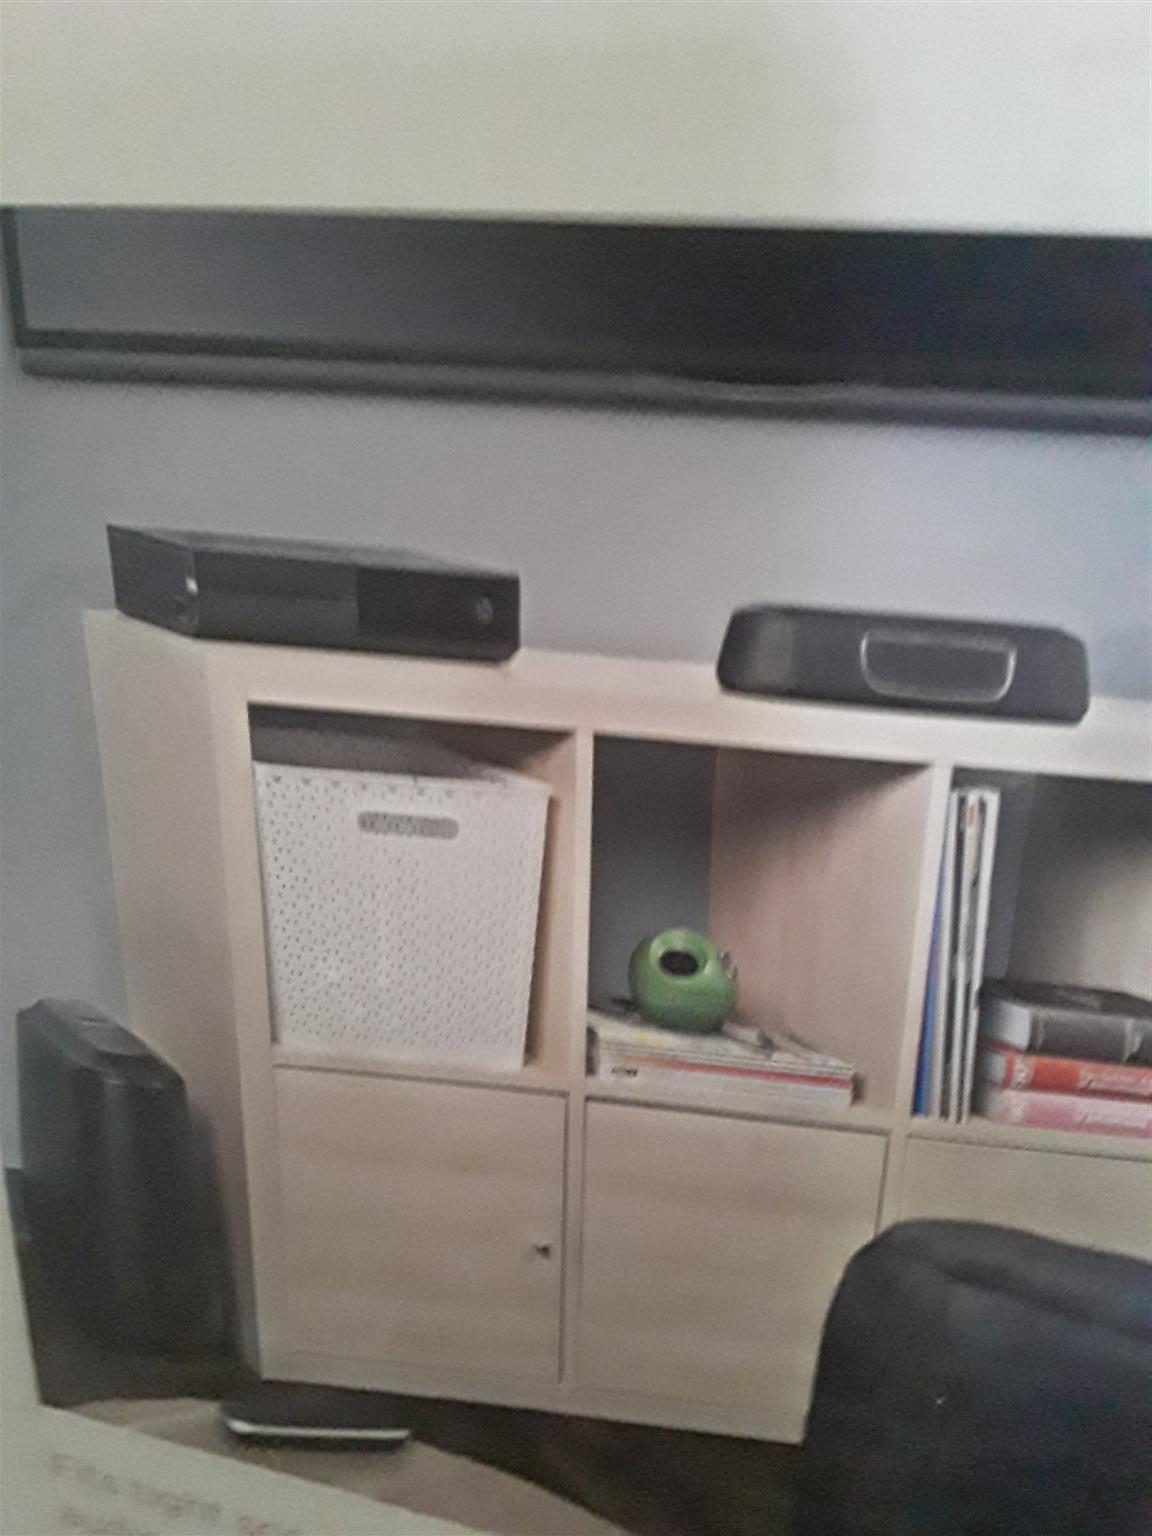 Polk magnifi mini sound bar system